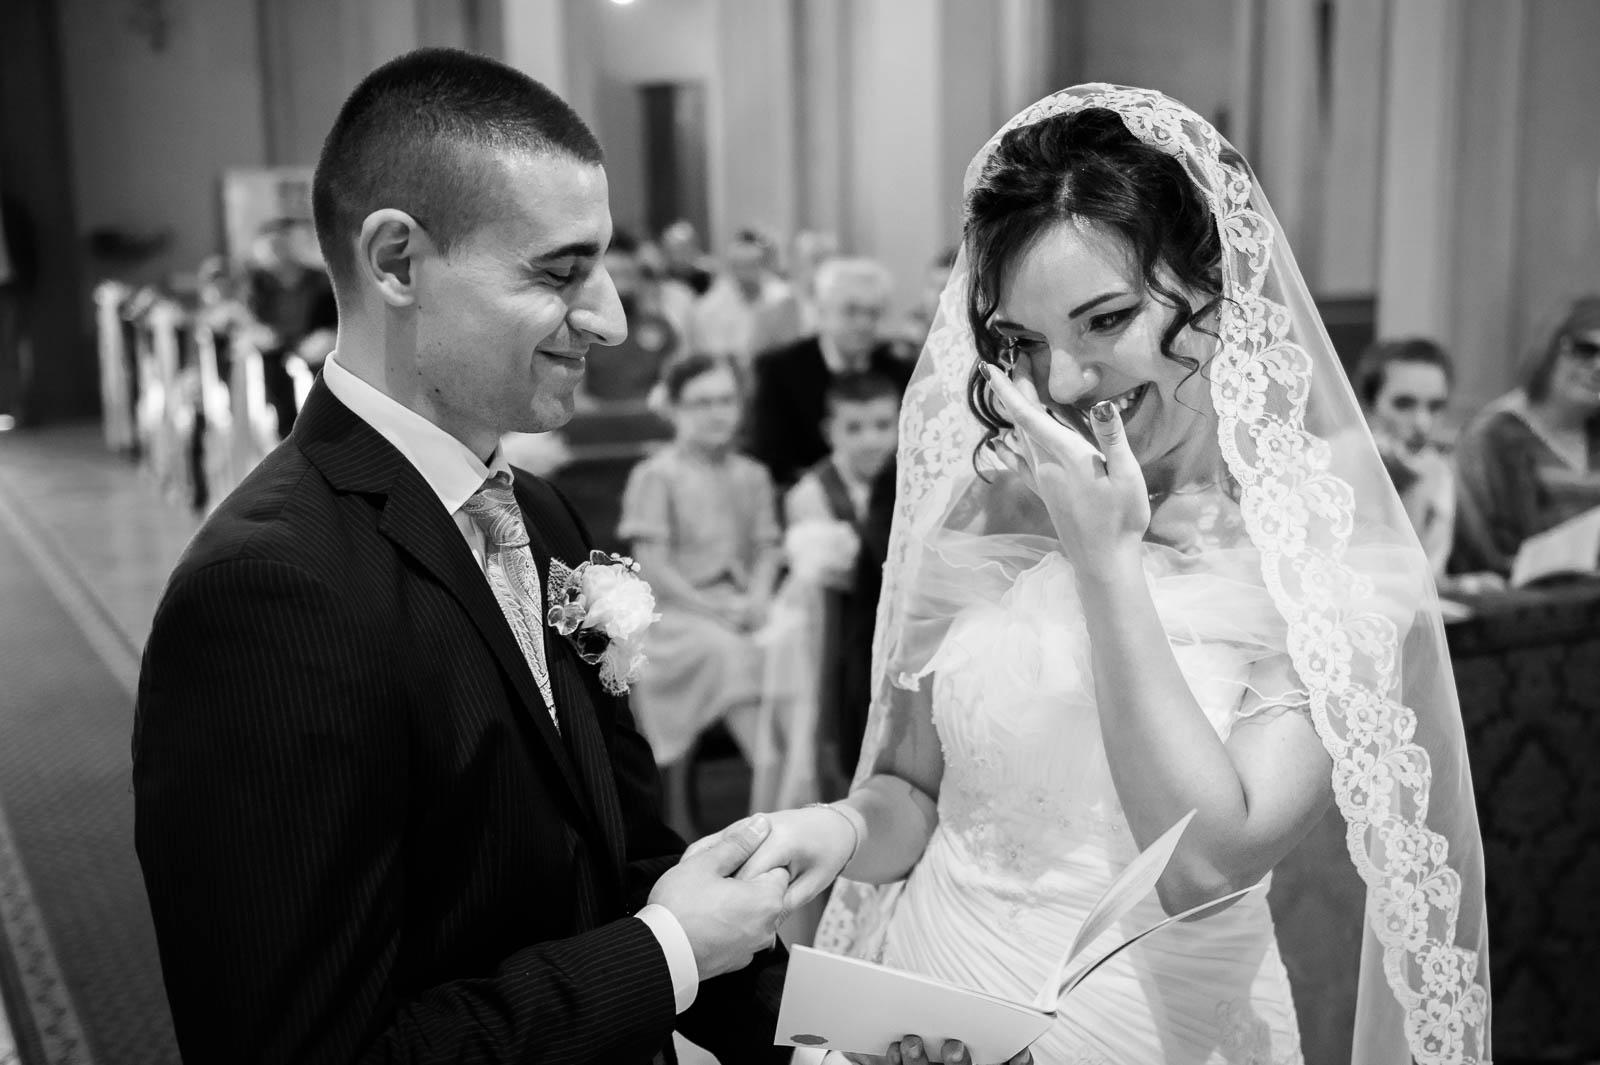 Foto-emozioni-matrimonio-italia-wedding-photographer-verona-italy